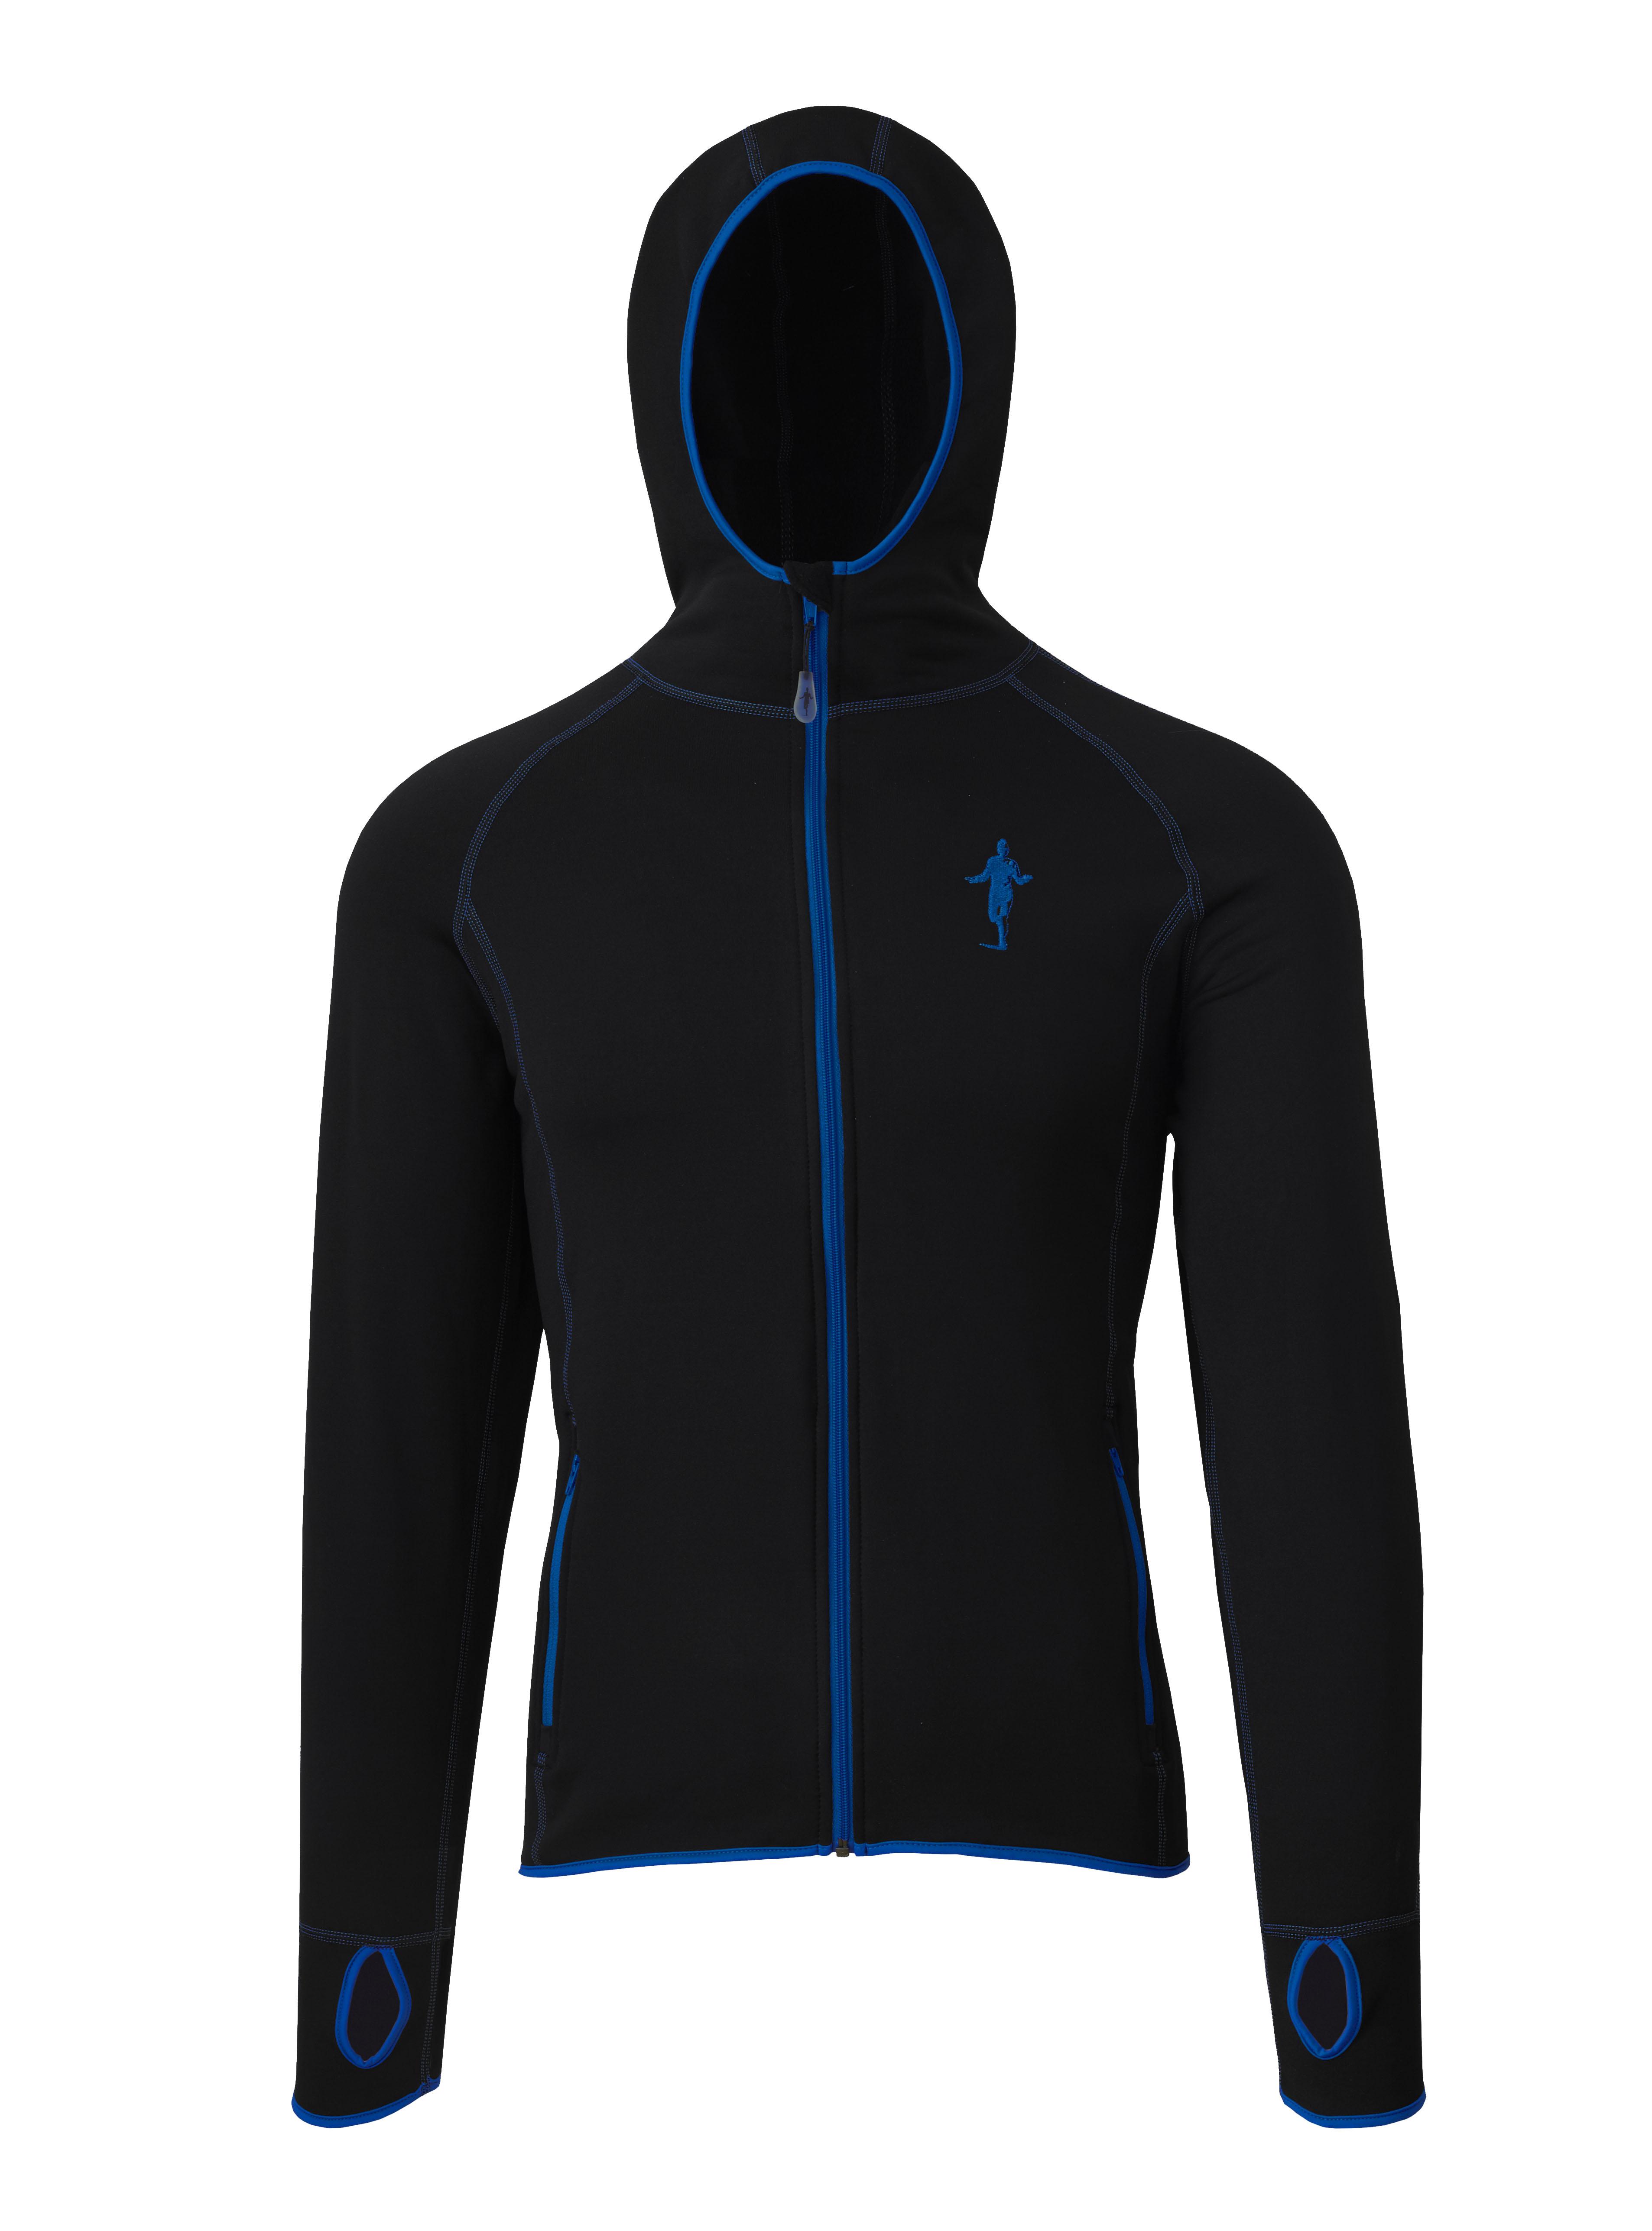 Thoni Mara Fleece Hoodie Kapuzenpullover schwarz blau